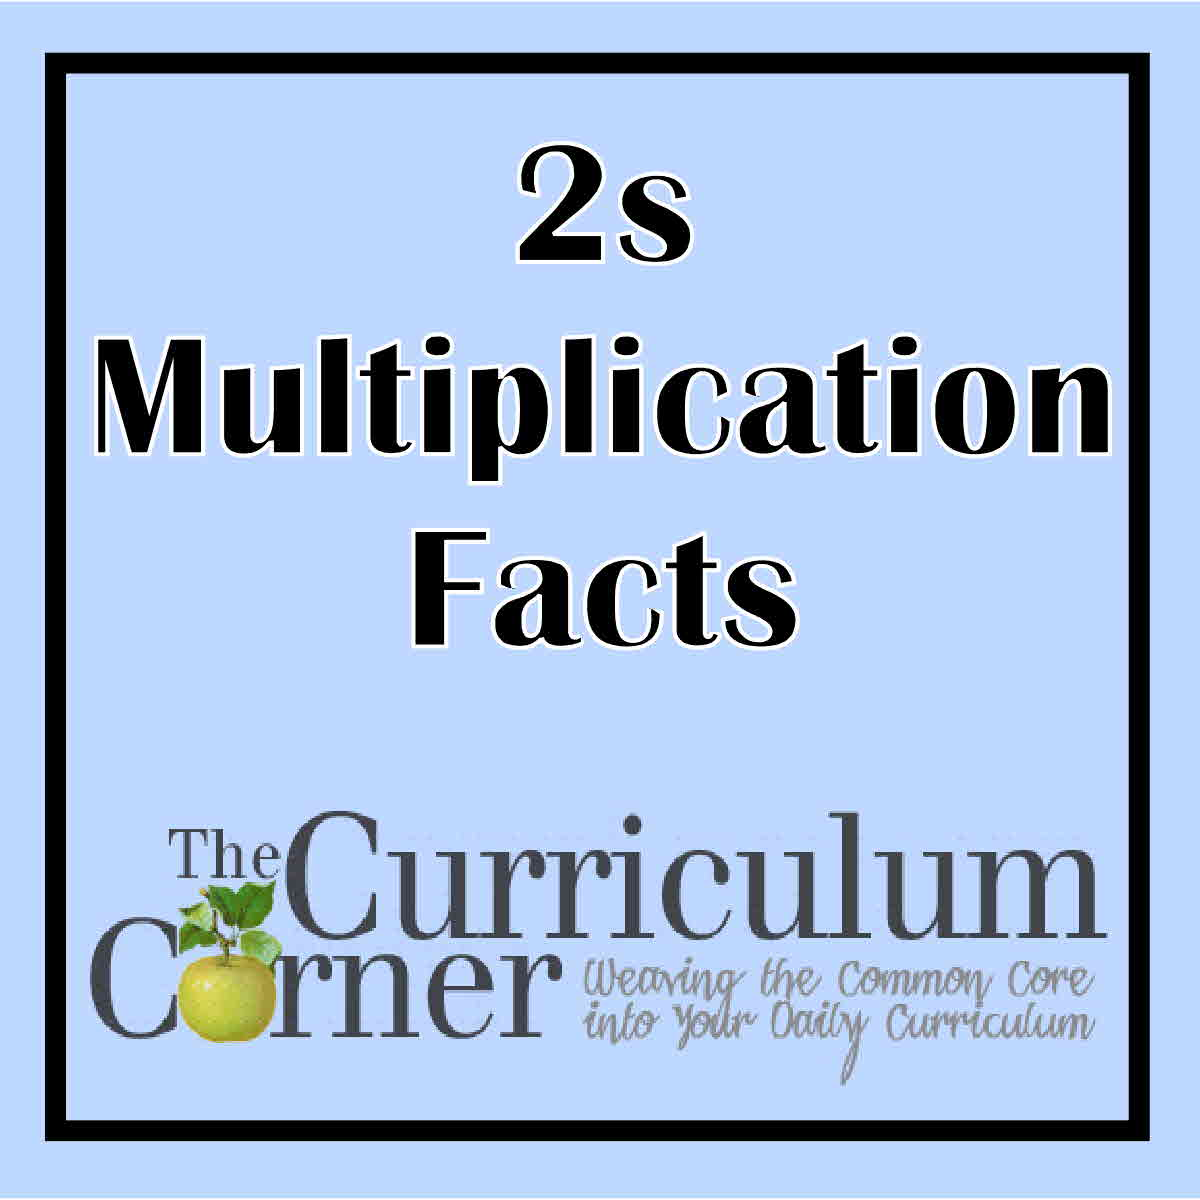 2s Multiplication Facts - The Curriculum Corner 123